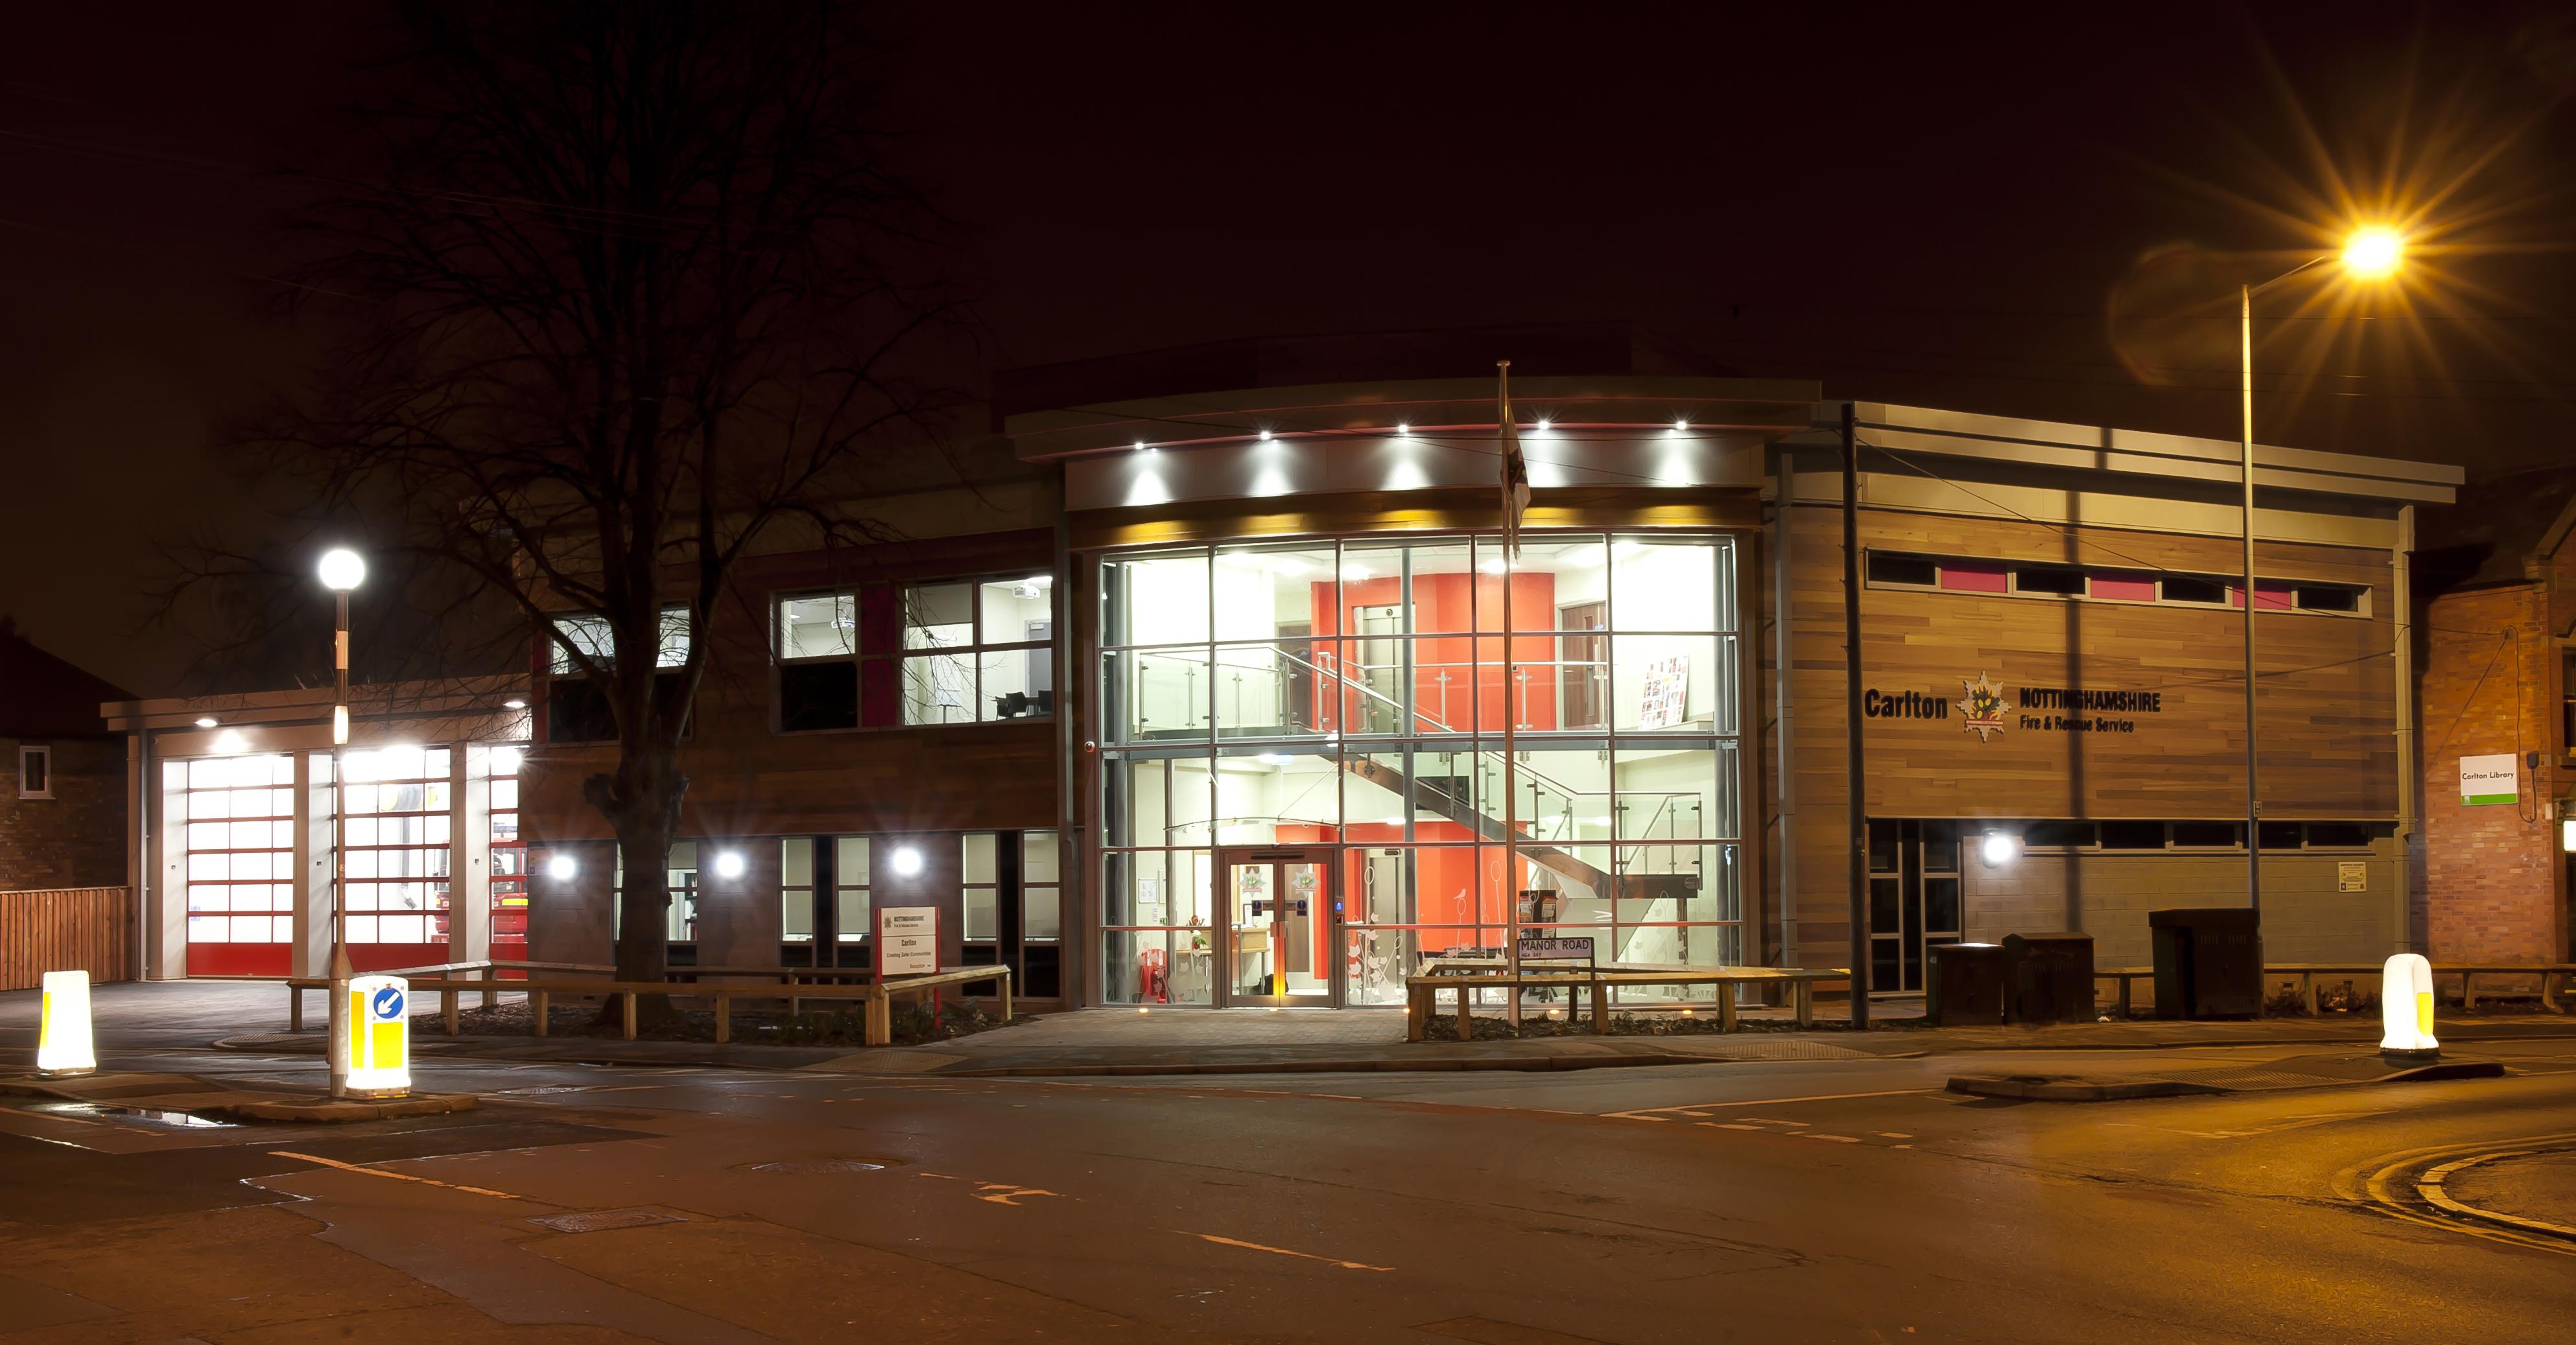 Carlton Fire Station